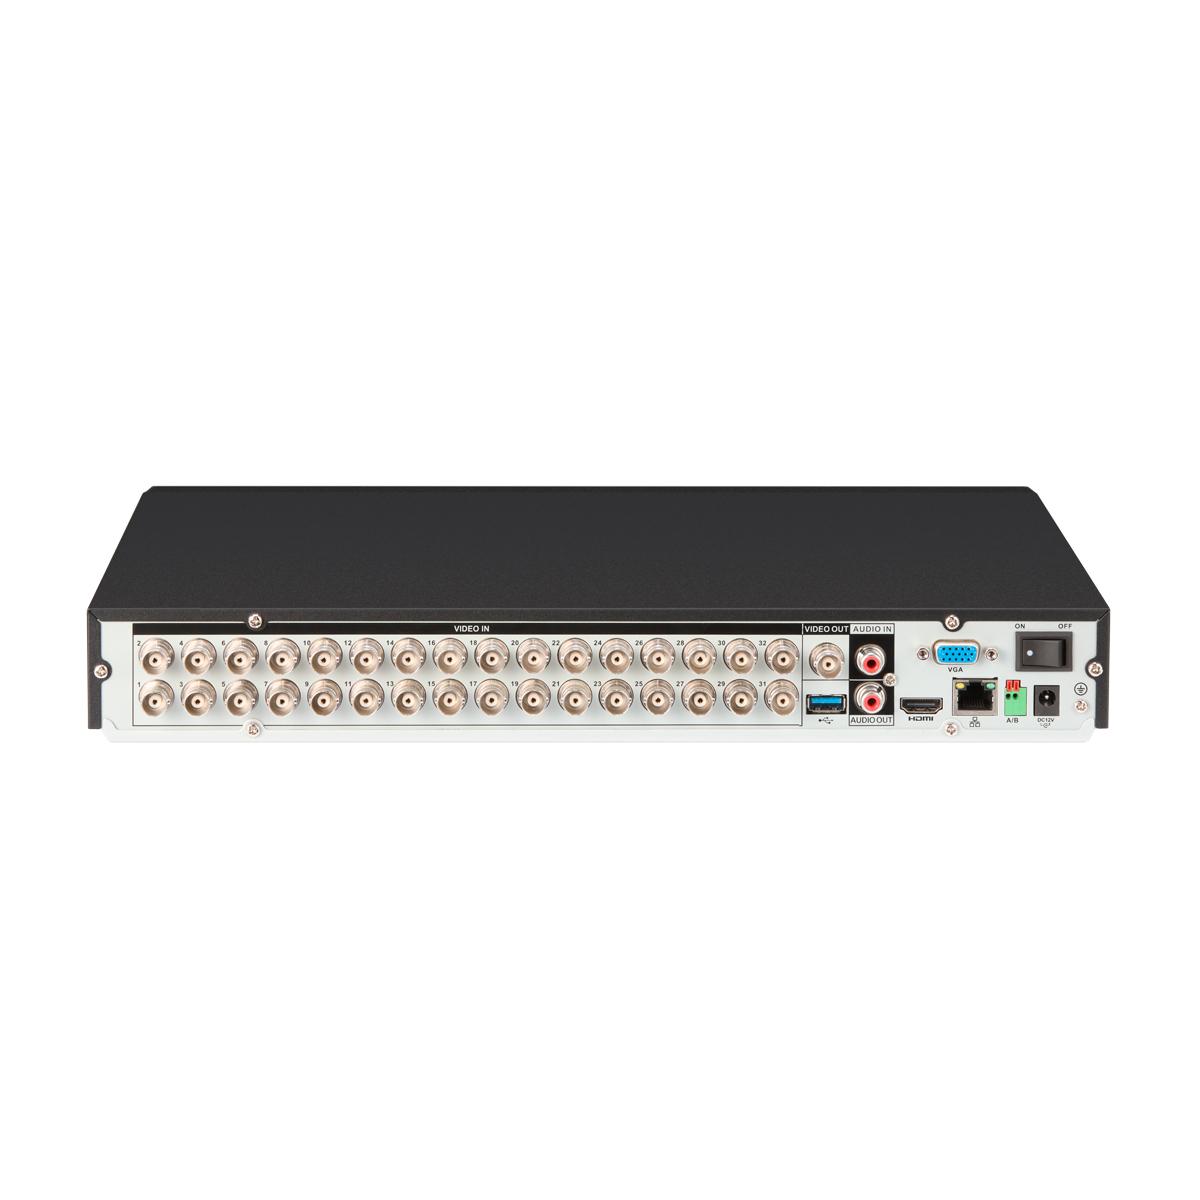 DVR 32 Canais Full HD 1080p Gravador digital de vídeo Intelbras MHDX 3132